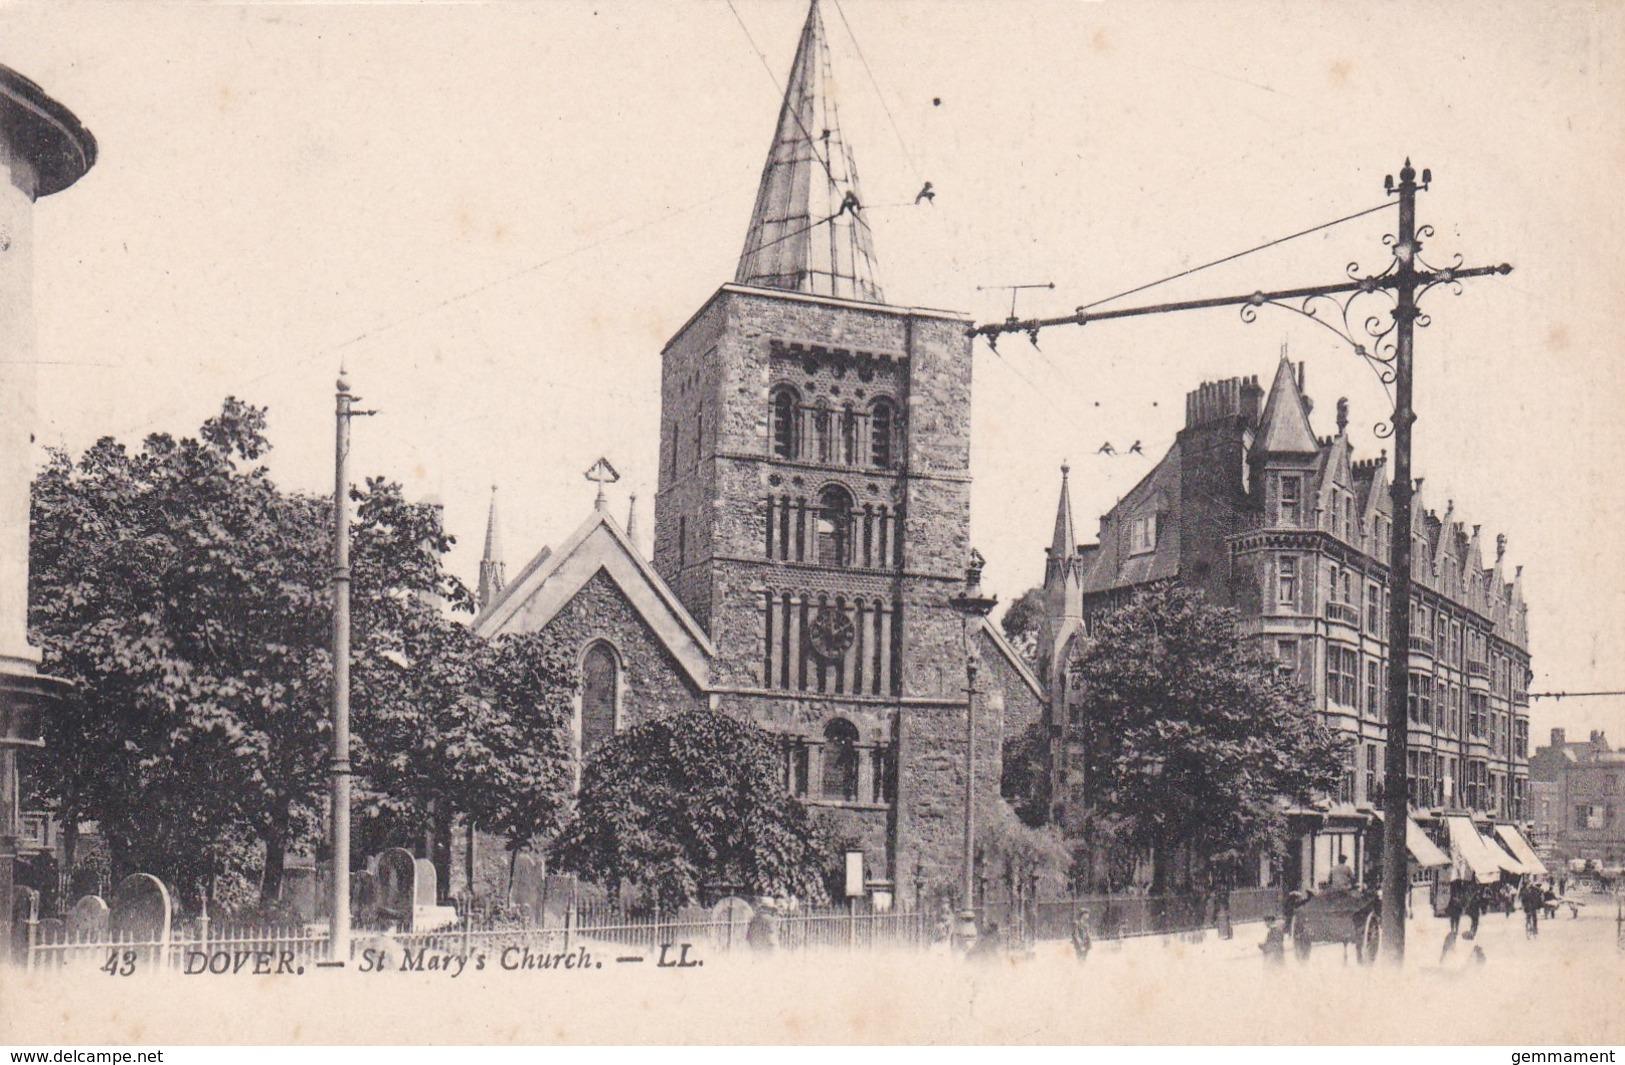 DOVER - ST MARYS CHURCH. LL 43 - Dover